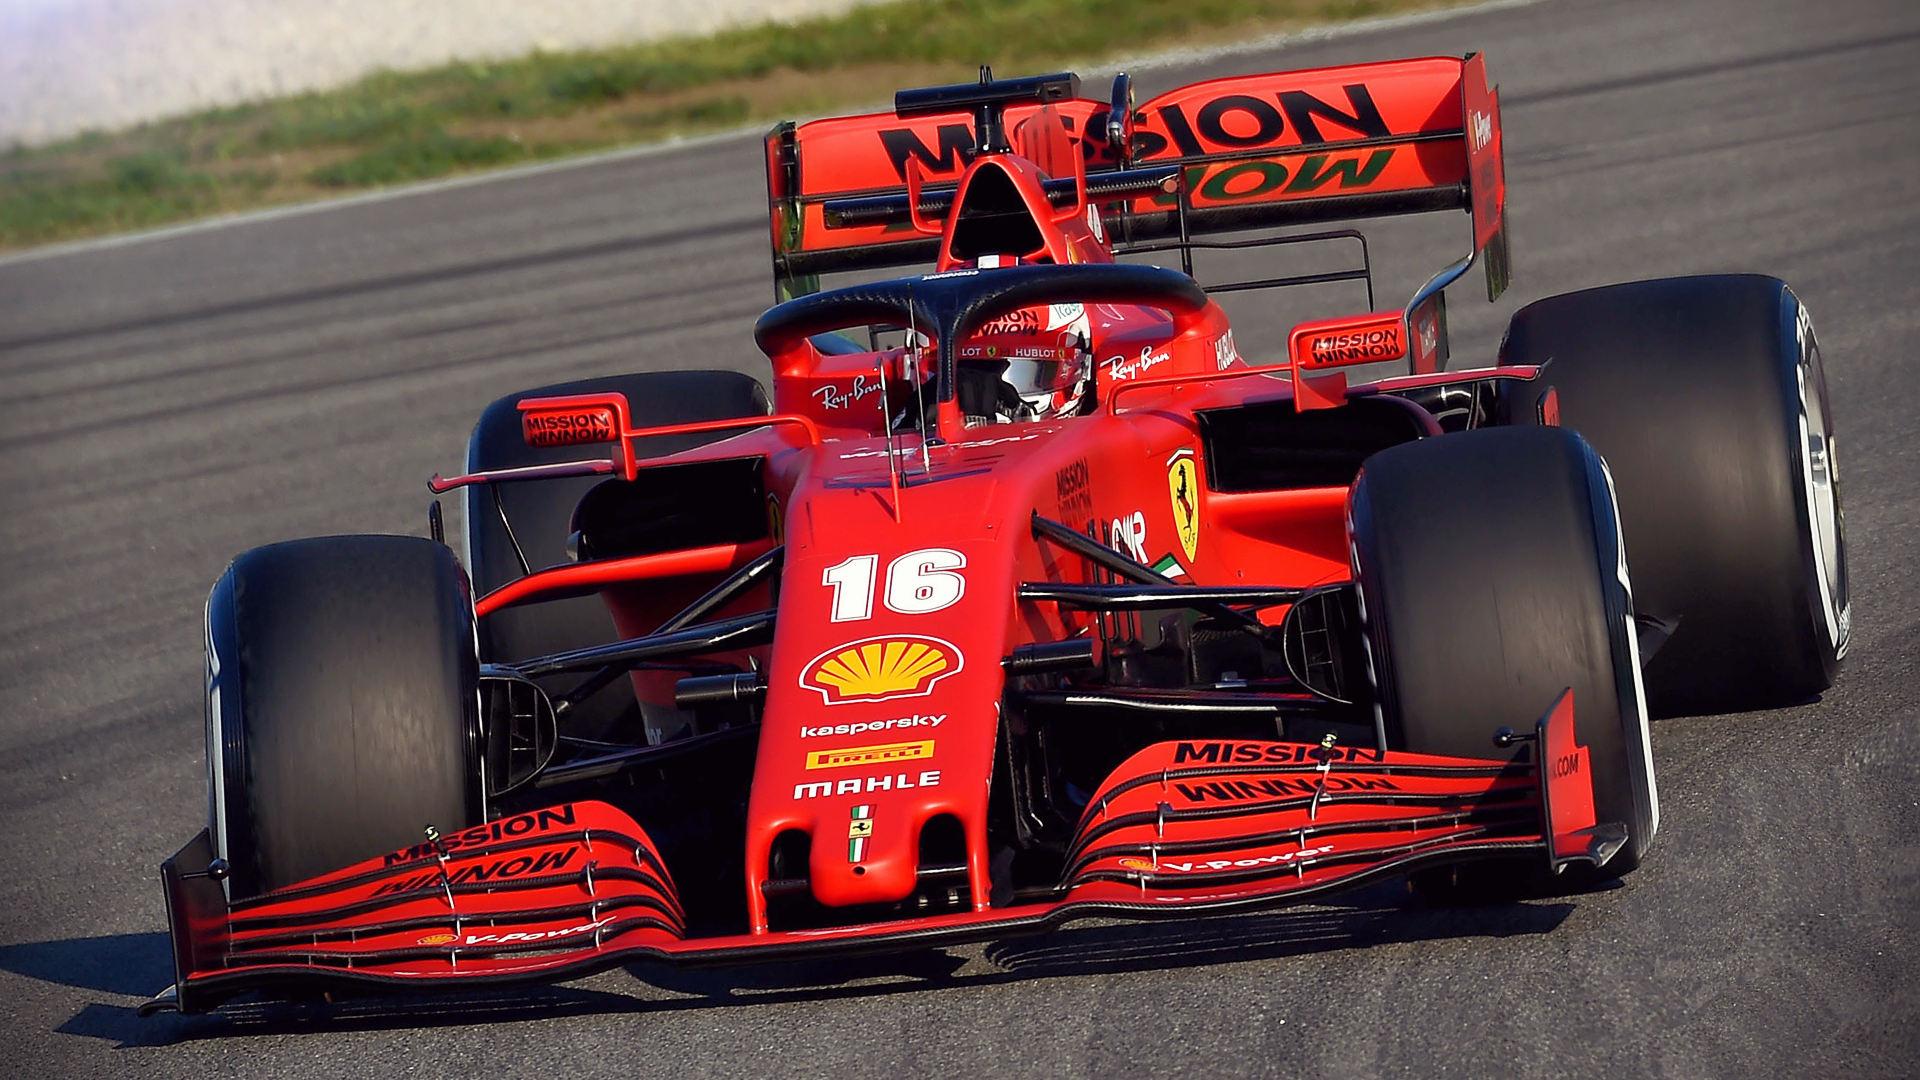 2020 Ferrari SF1000 Wallpaper